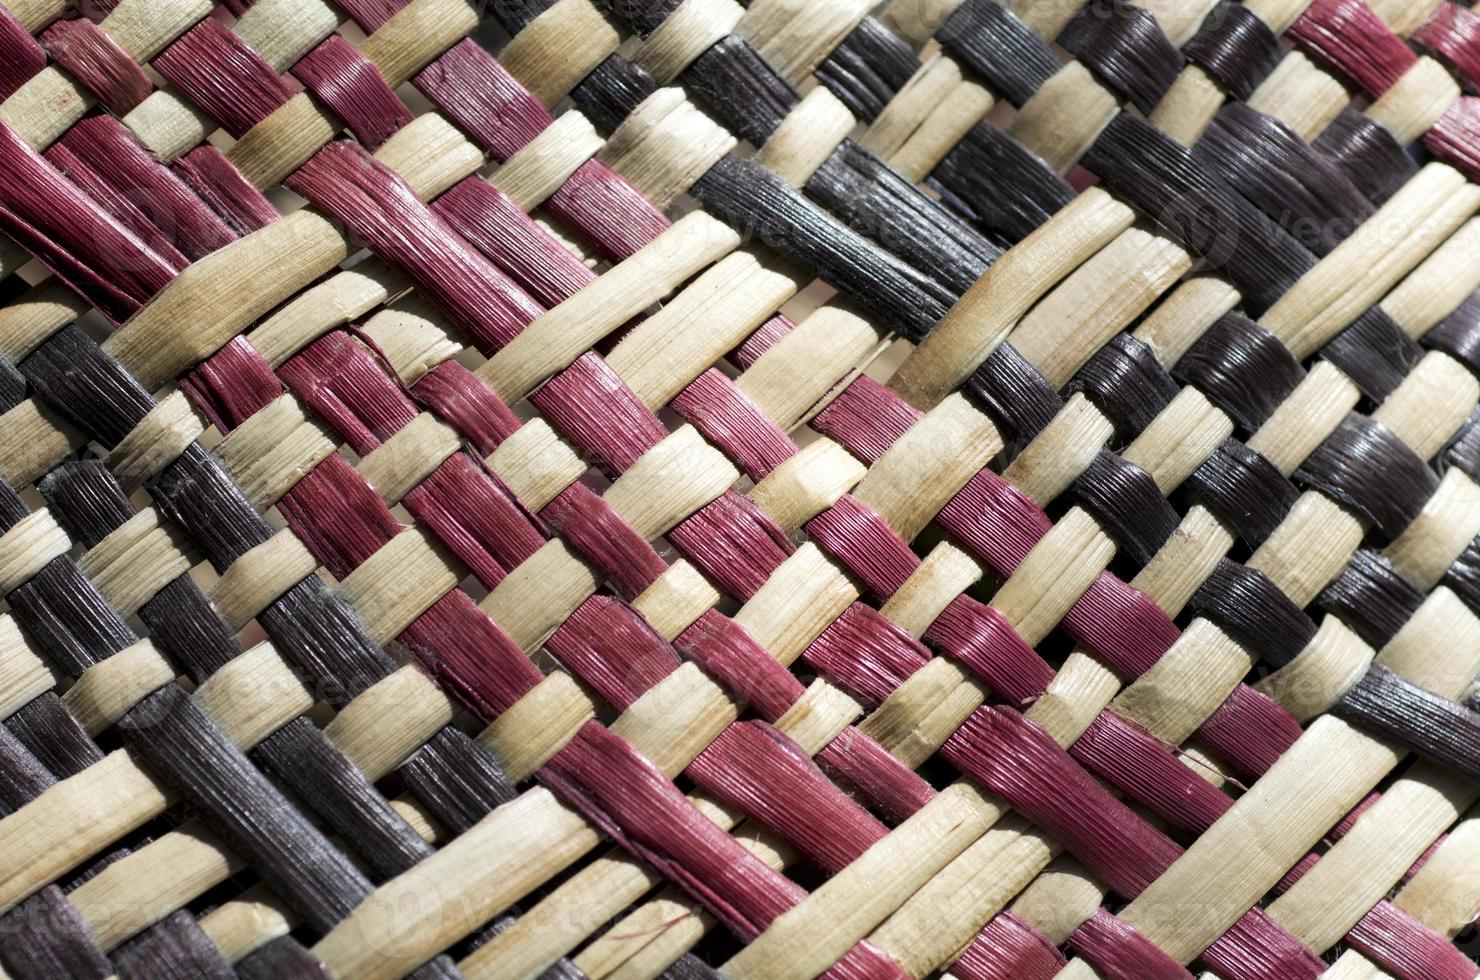 maori cultuur - geweven vlas foto